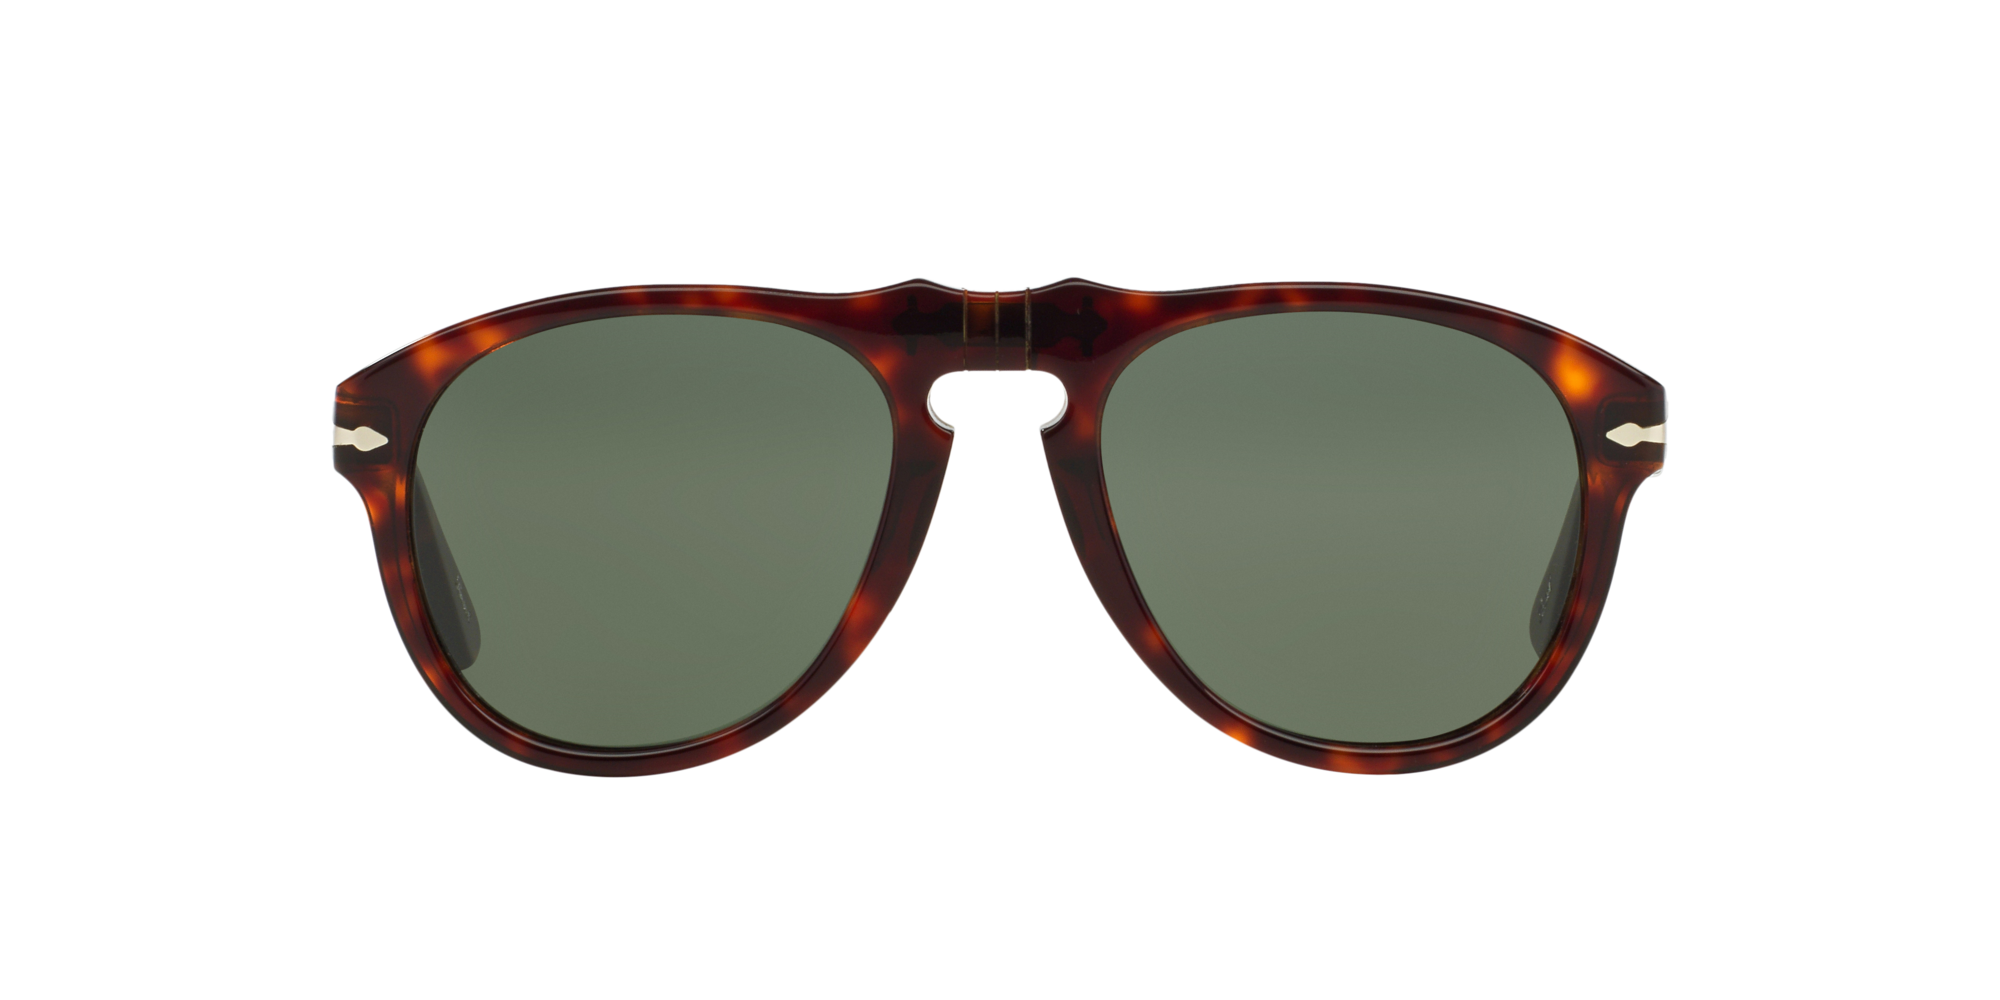 Image for PO0649 54 from LensCrafters | Glasses, Prescription Glasses Online, Eyewear